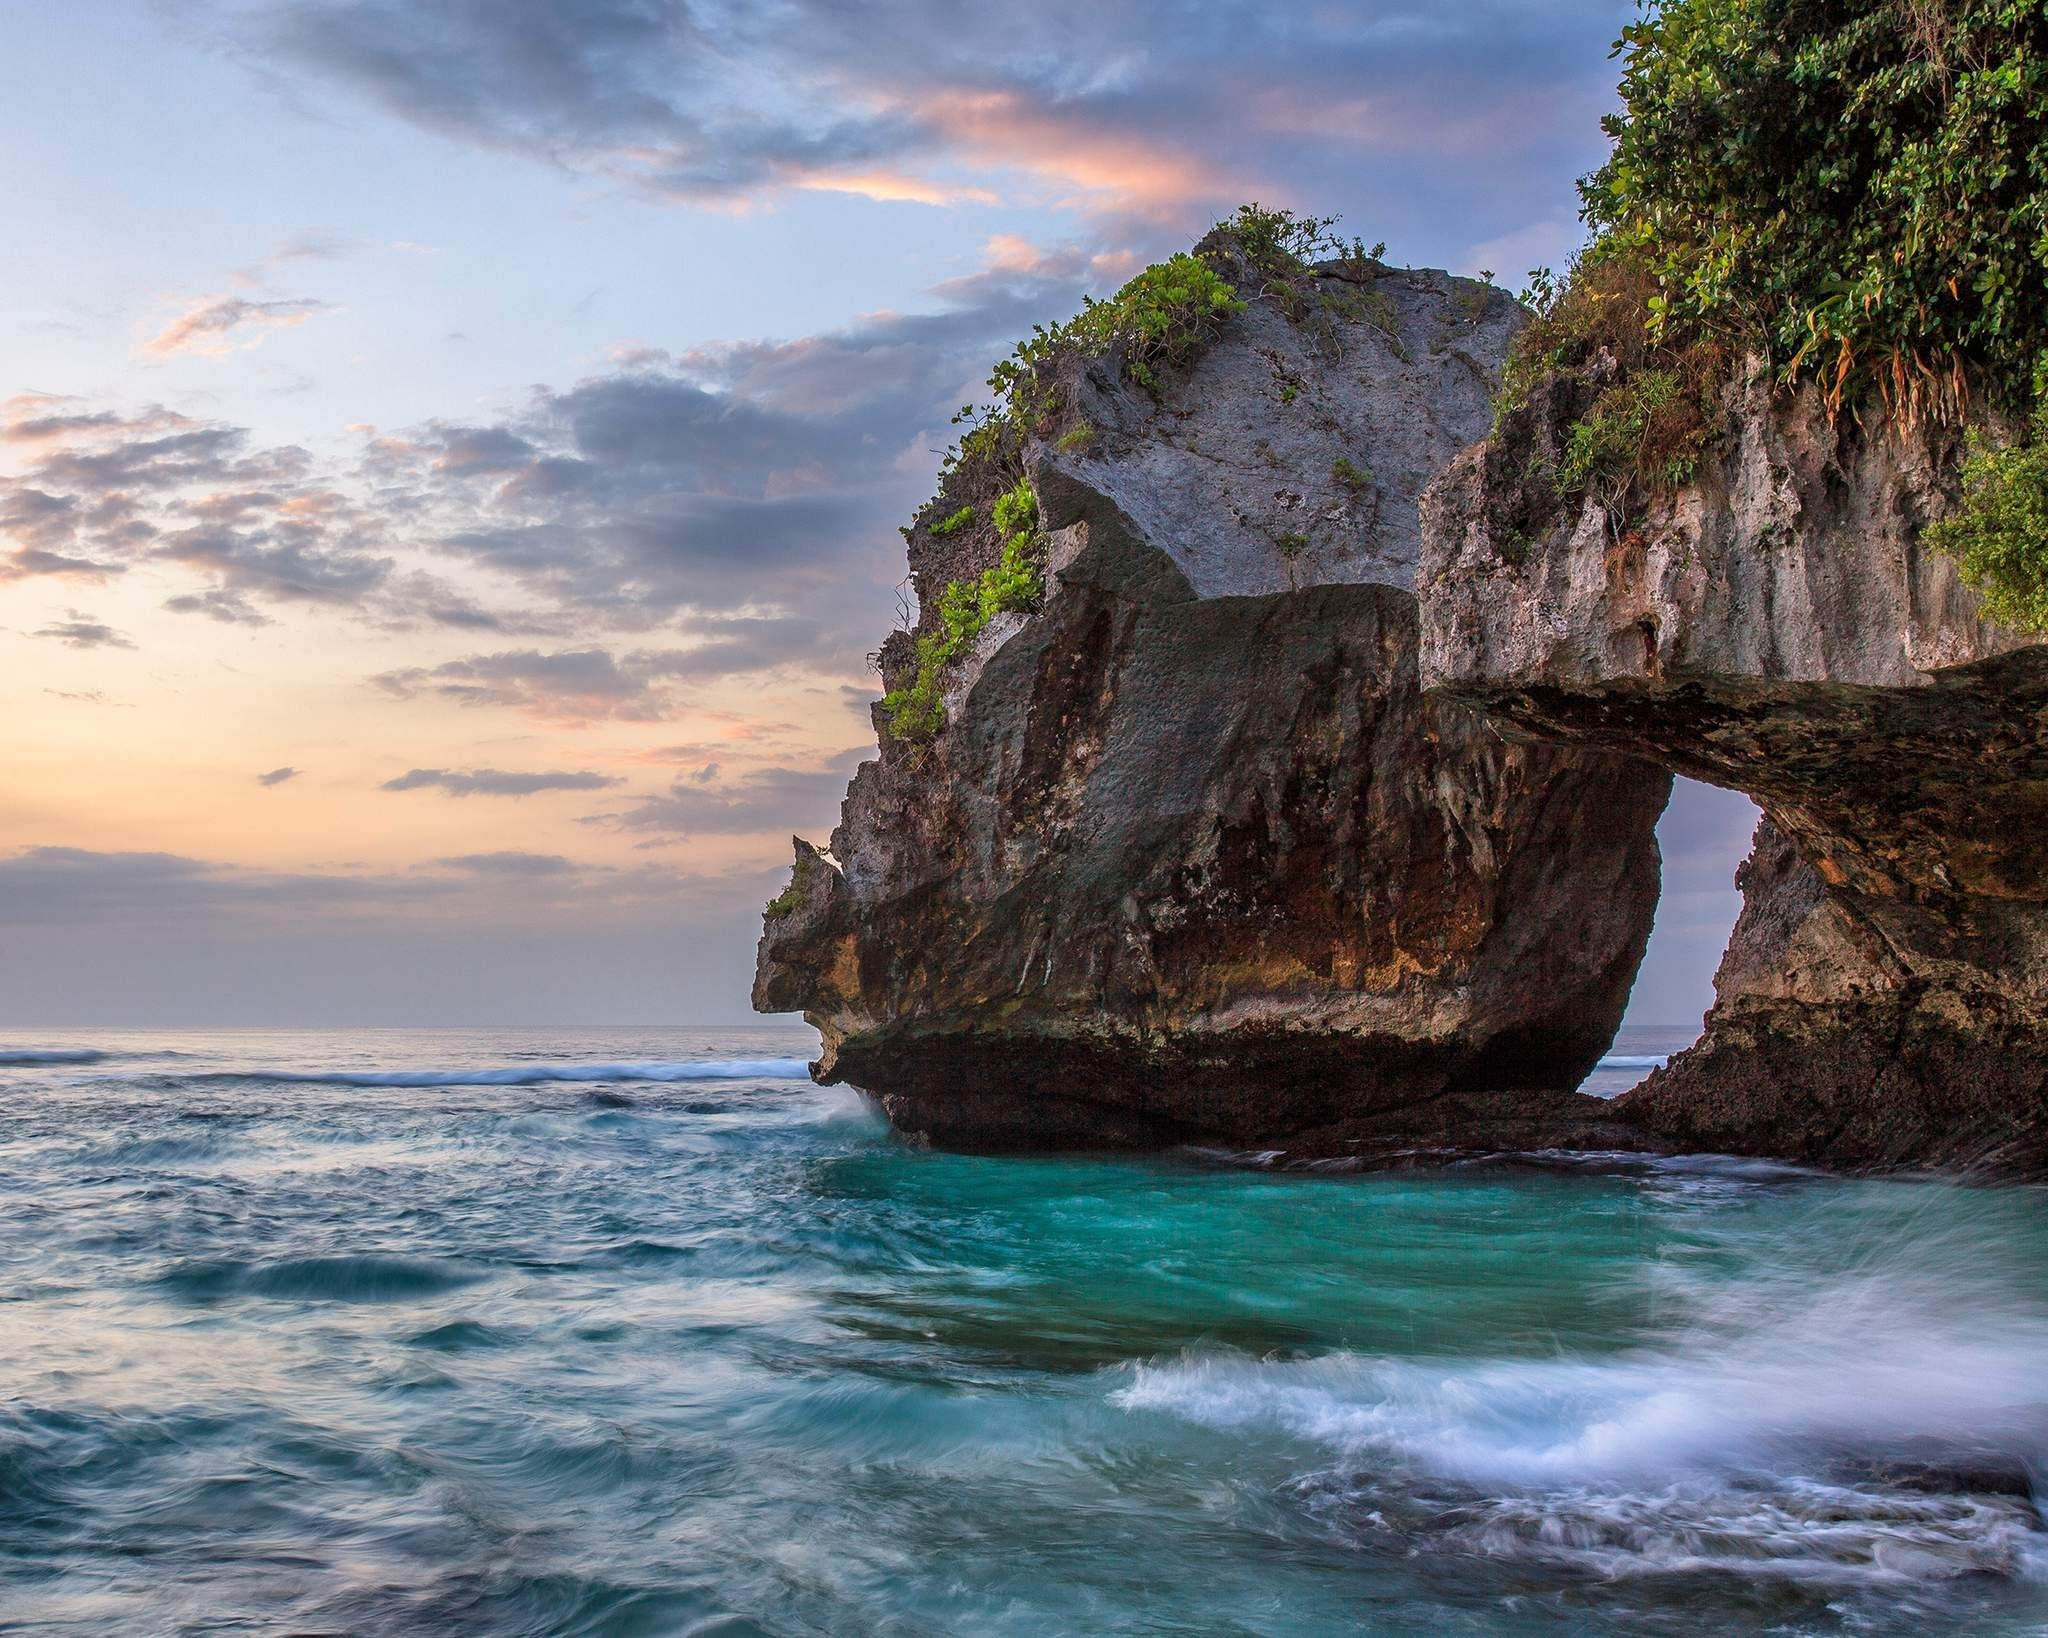 Ocean Cliff Wallpaper (58+ Images